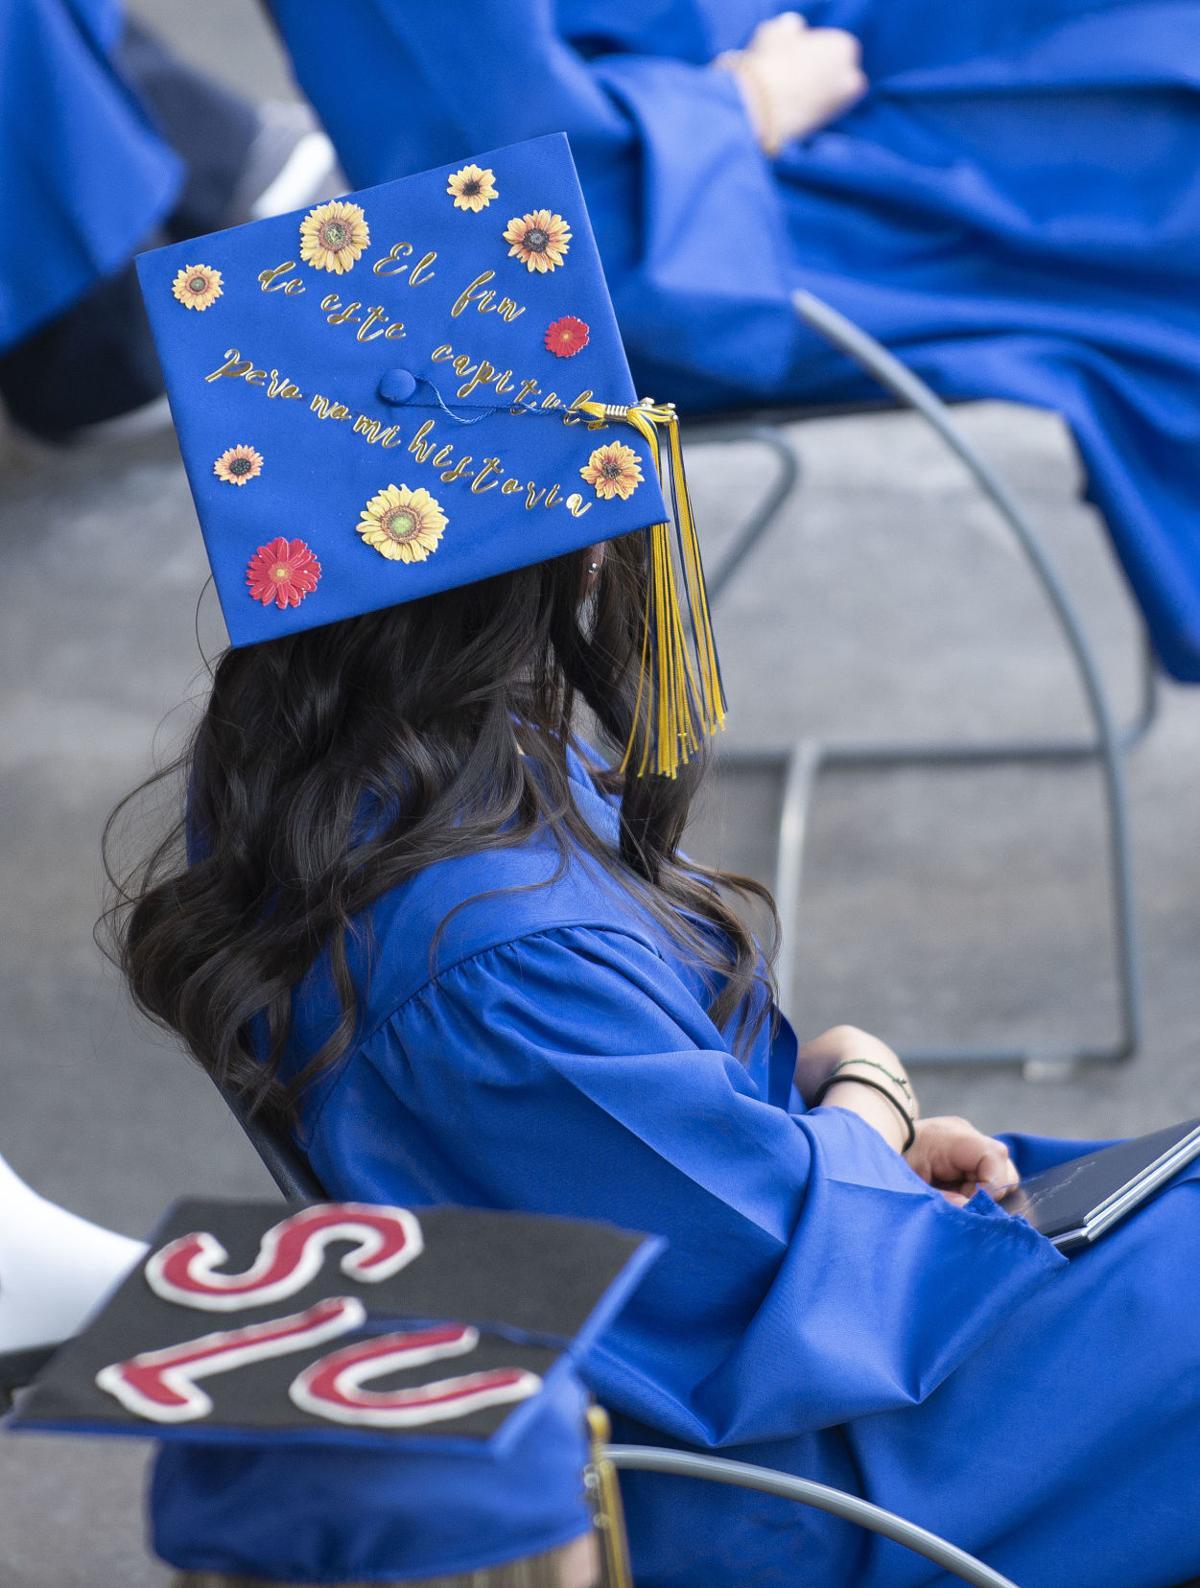 Jackson Hole Community School graduation